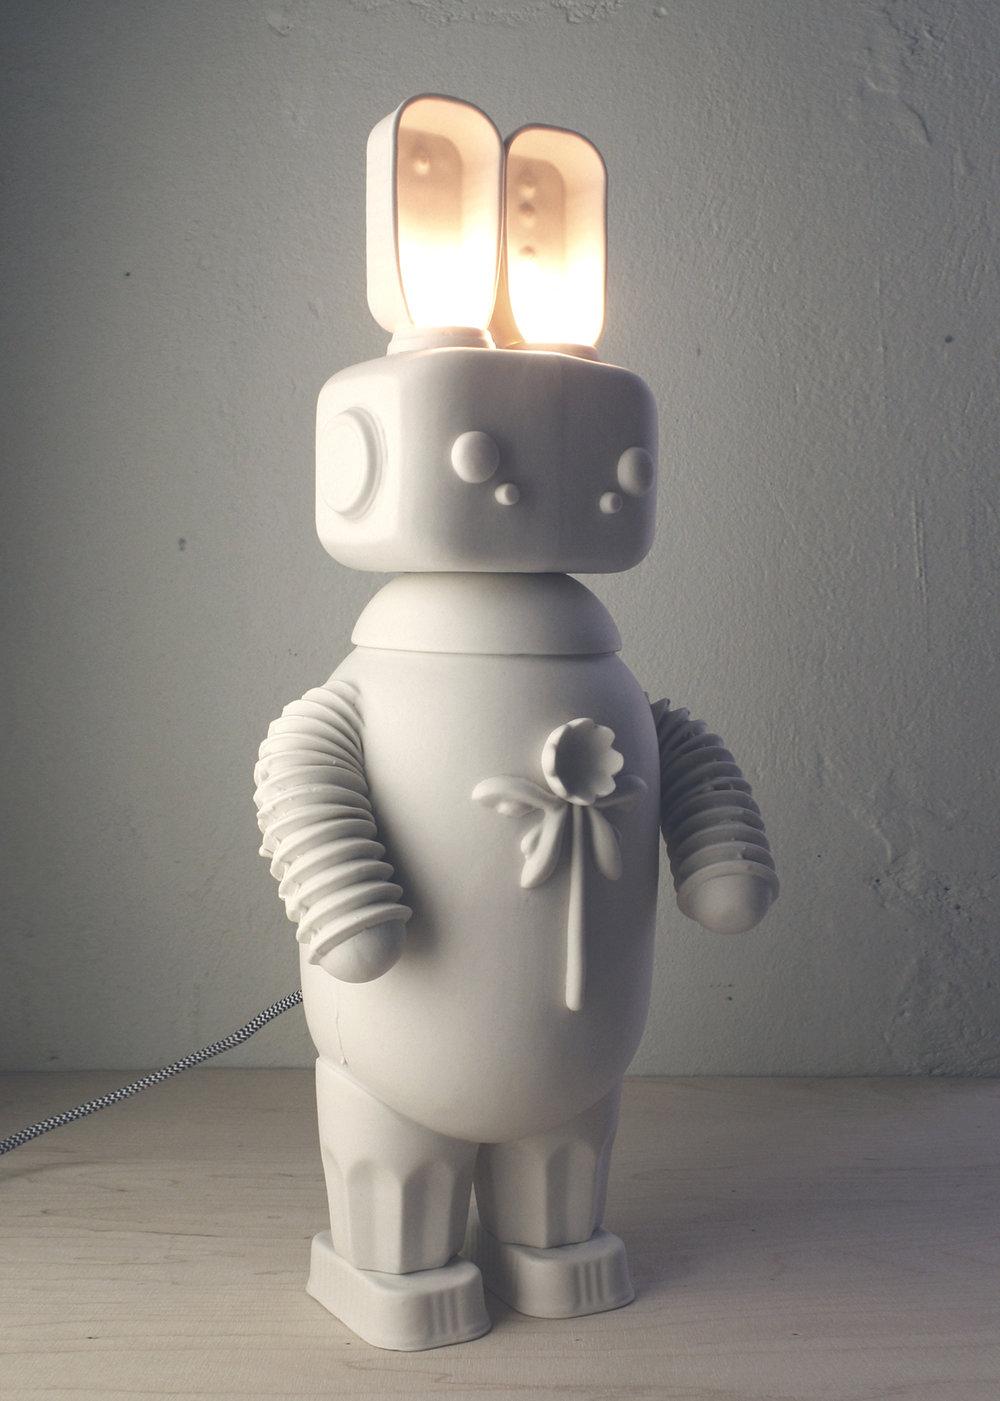 Enlightened Rabbit, 2016